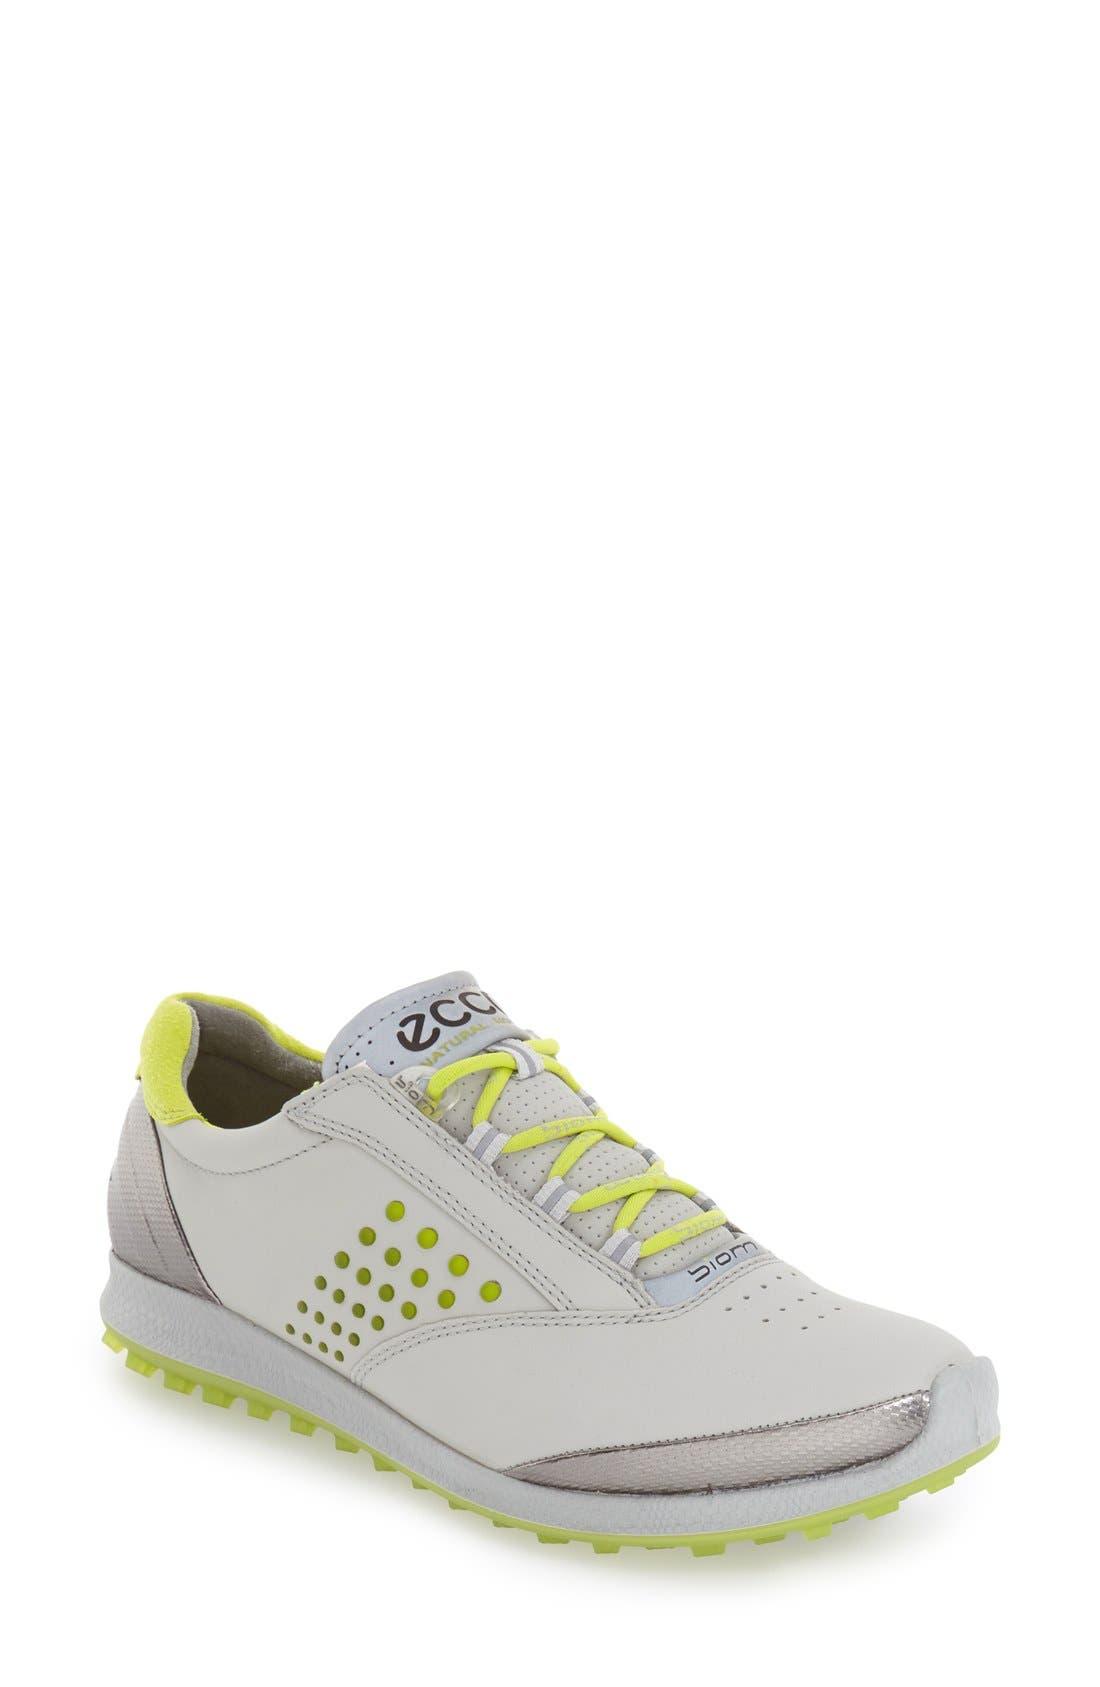 'BIOM' Hydromax<sup>®</sup> Waterproof Golf Shoe,                         Main,                         color, Concrete Leather